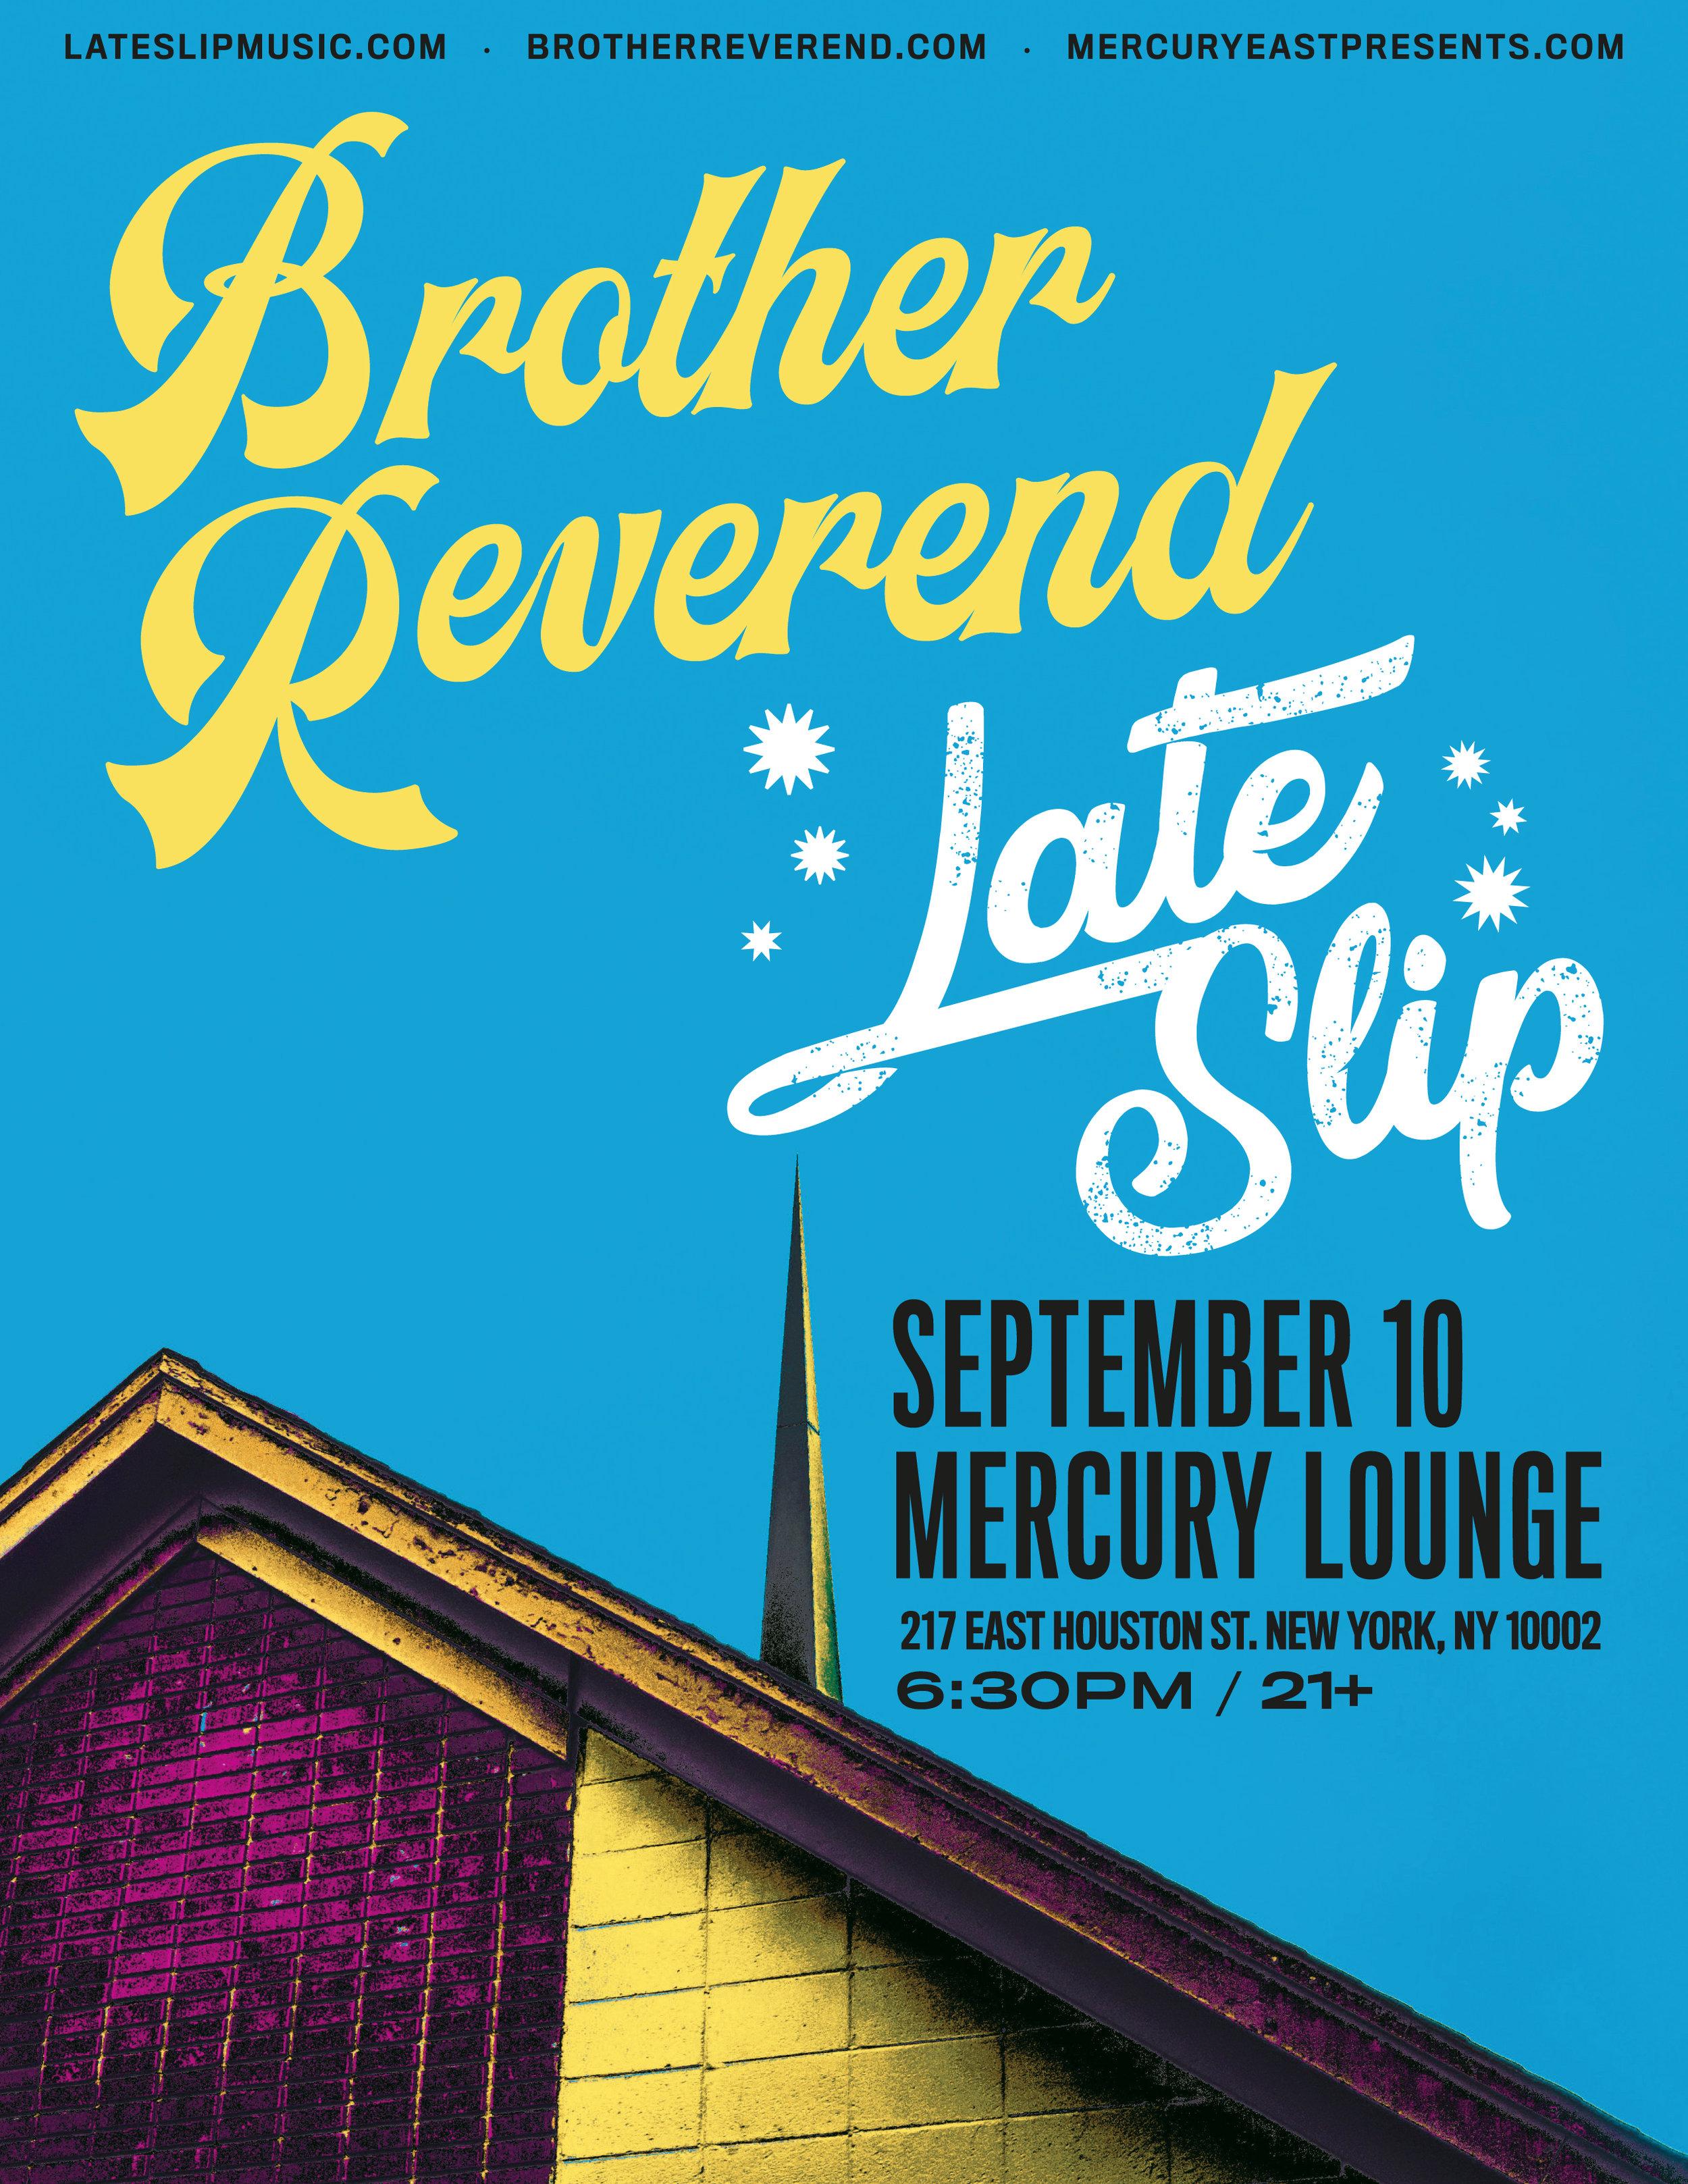 Late Slip Poster Mercury Lounge 9_10_18.jpg